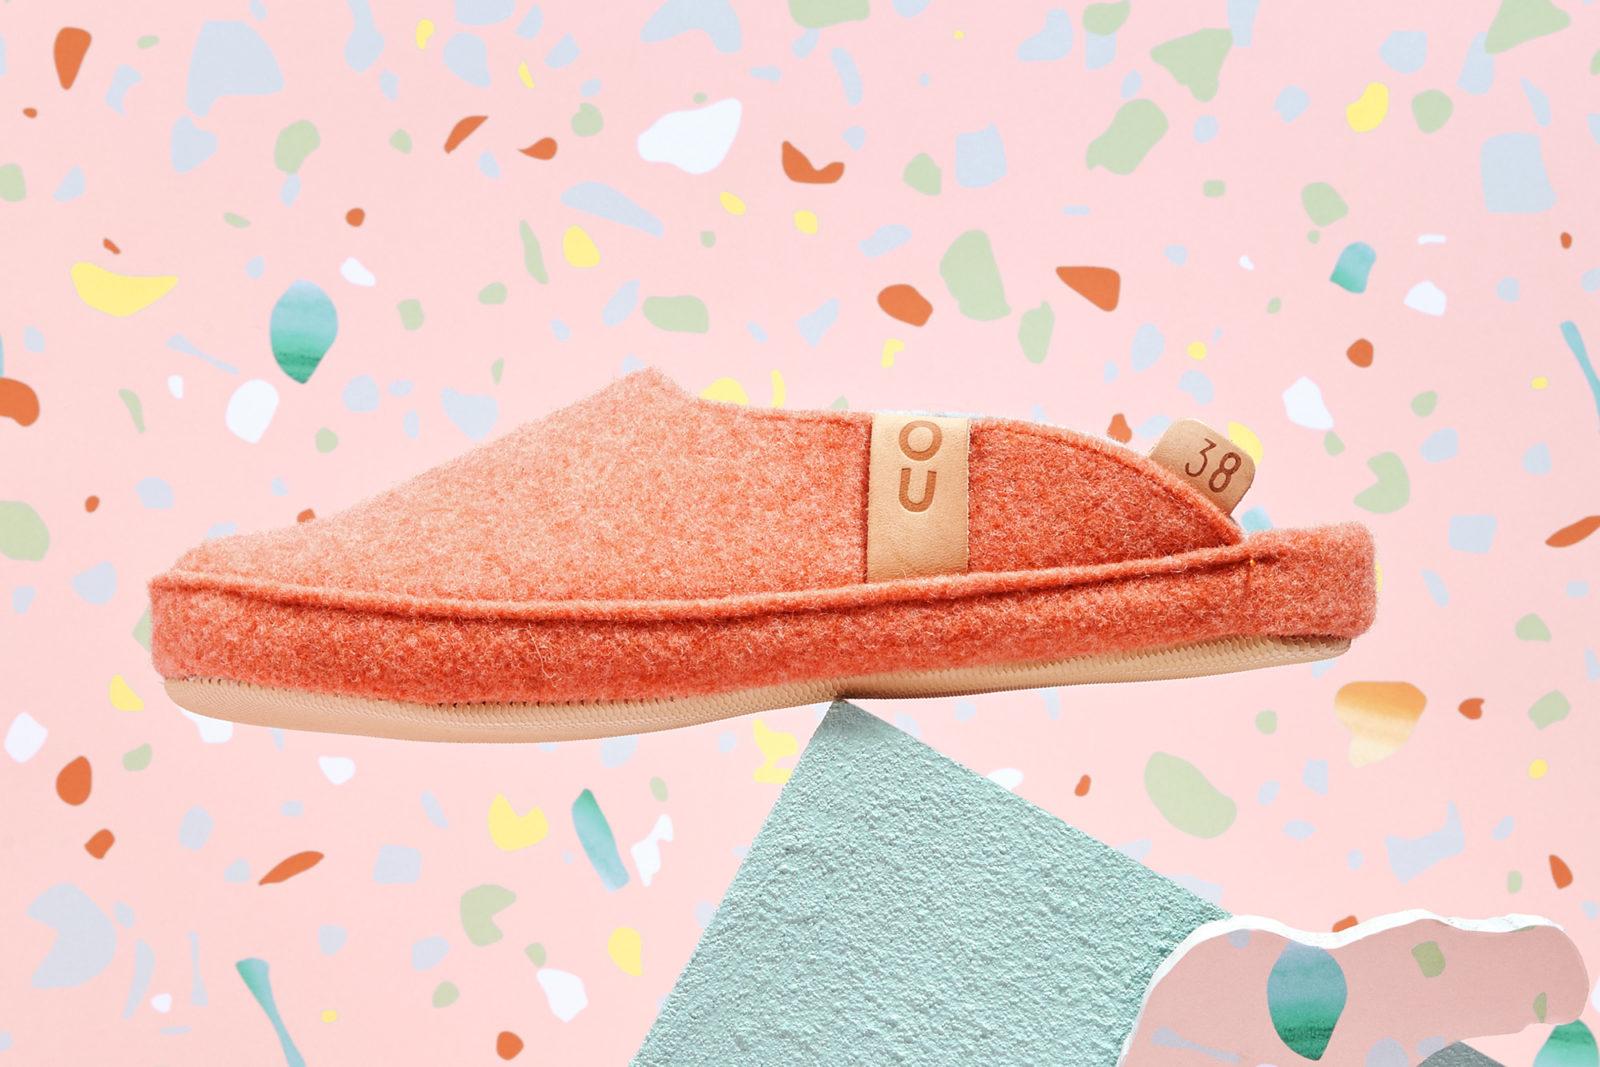 Handmade orange slippers